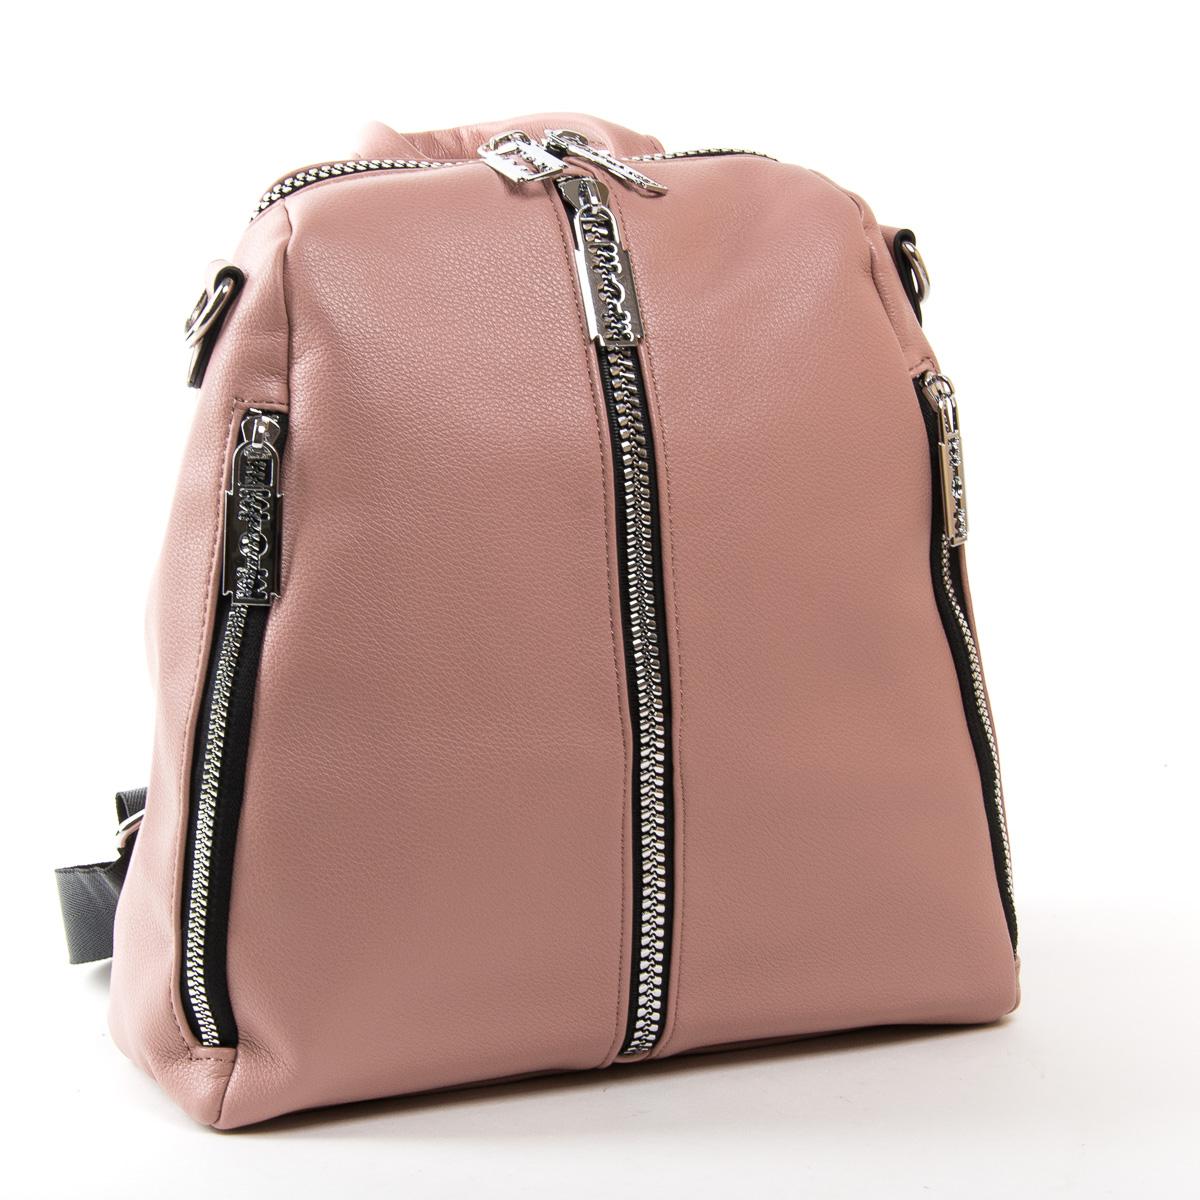 Сумка Женская Рюкзак иск-кожа FASHION 01-02 6487 pink